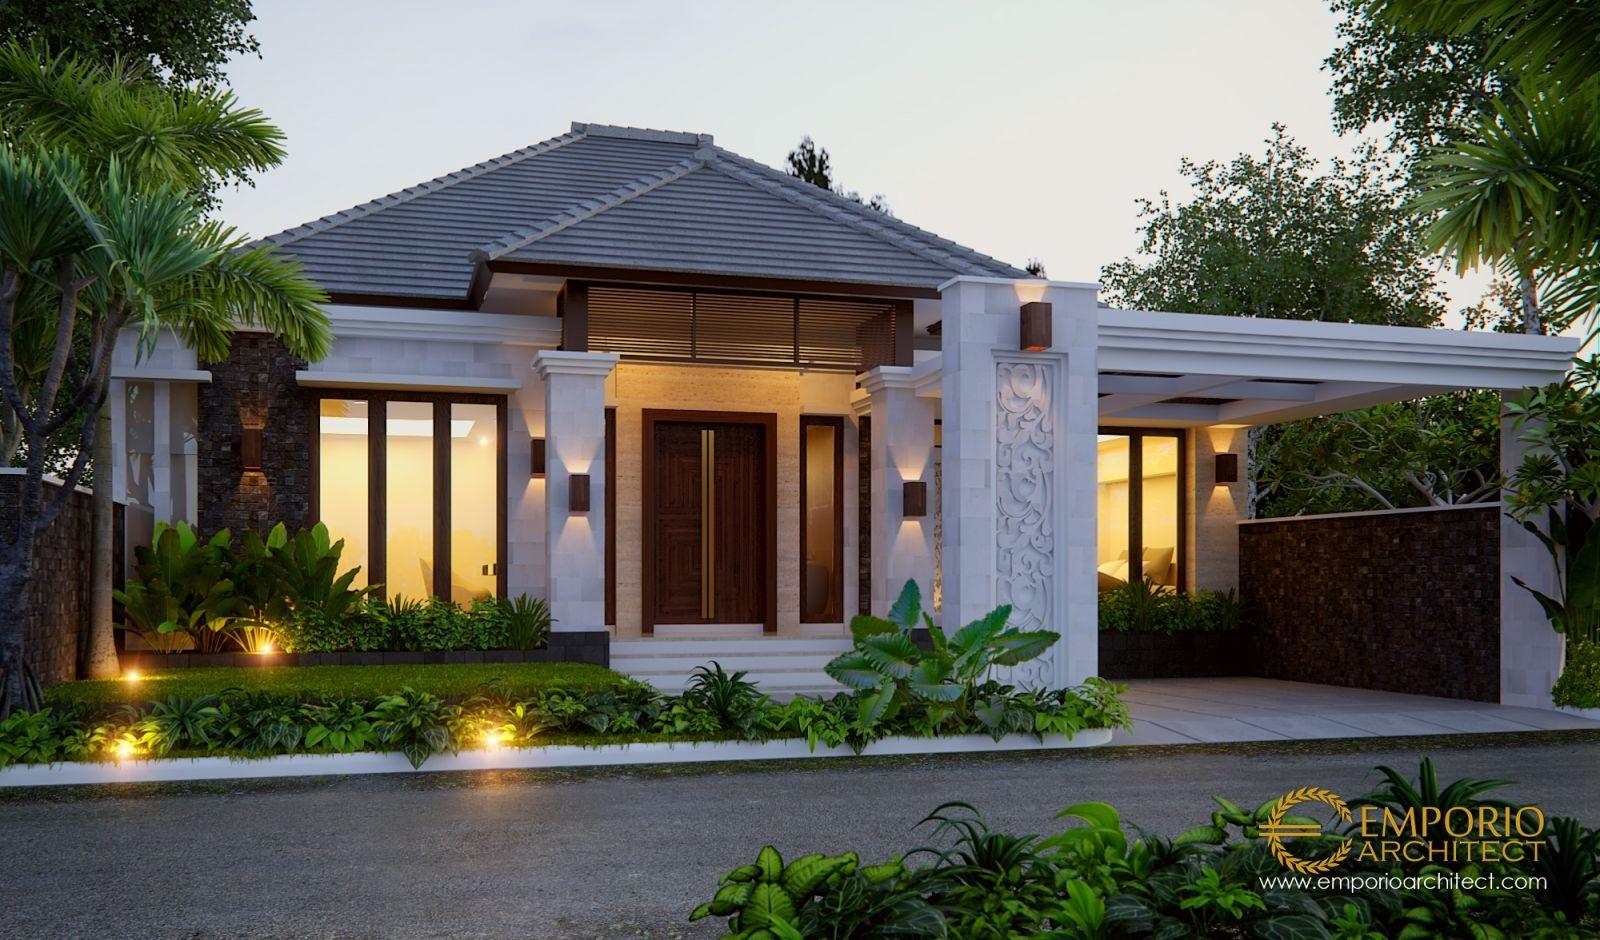 Jasa Arsitek Padang Sumatera Barat Desain Rumah Villa Bali Tropis